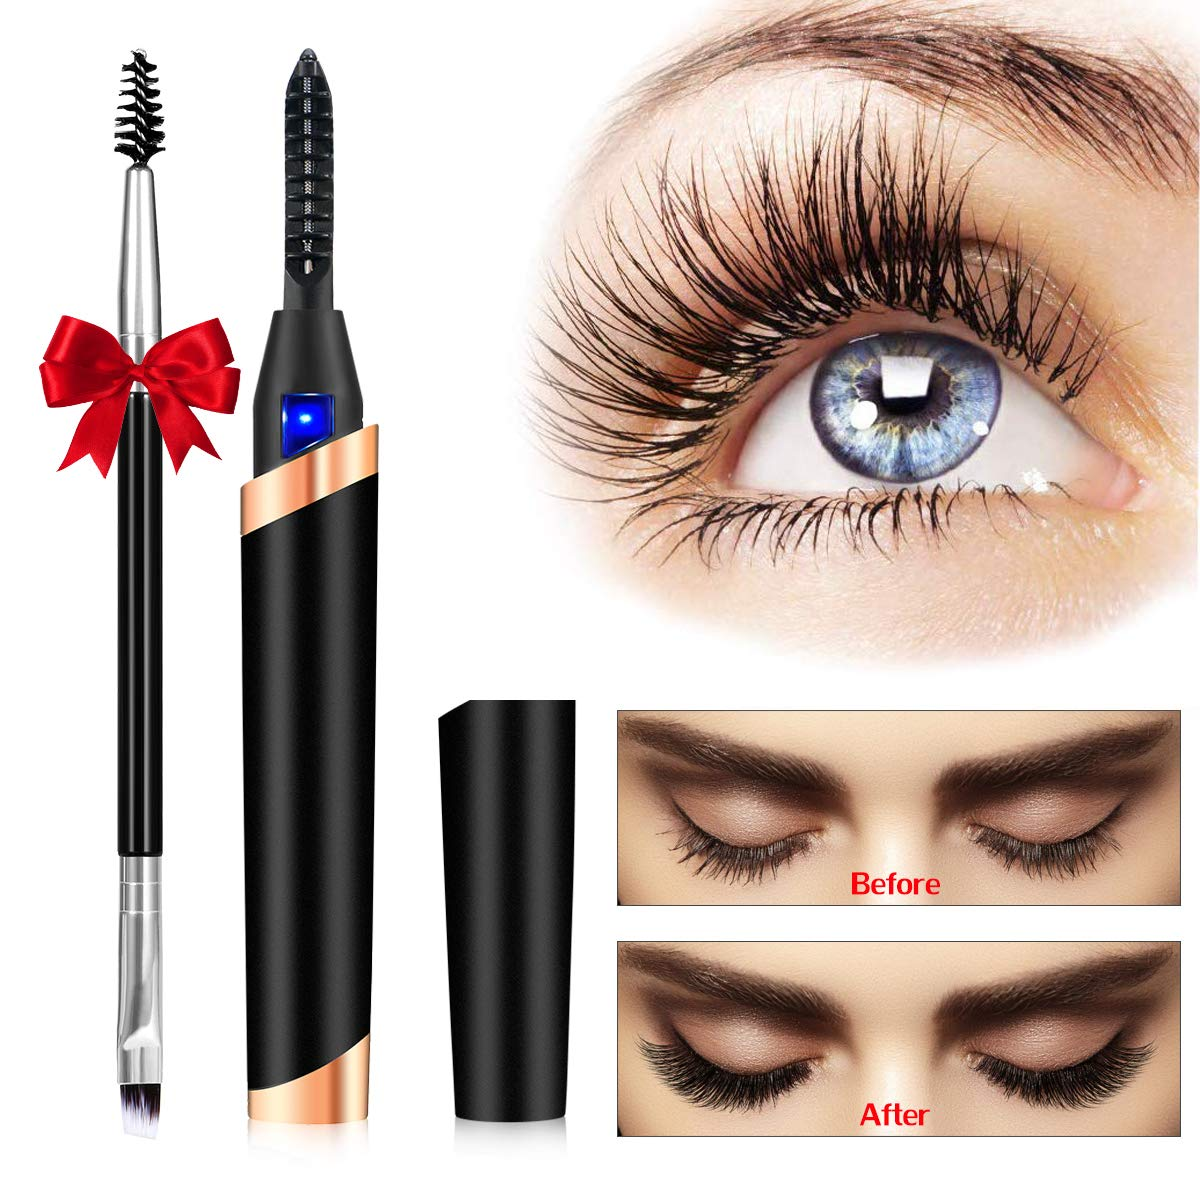 Heated Eyelash Curler, Electric Eyelash Curler, Portable Electric Makeup Eye Lashes Brush [New Upgrade] - Quick Heating Long Lasting, USB Rechargeable Eyelash Curler Tool